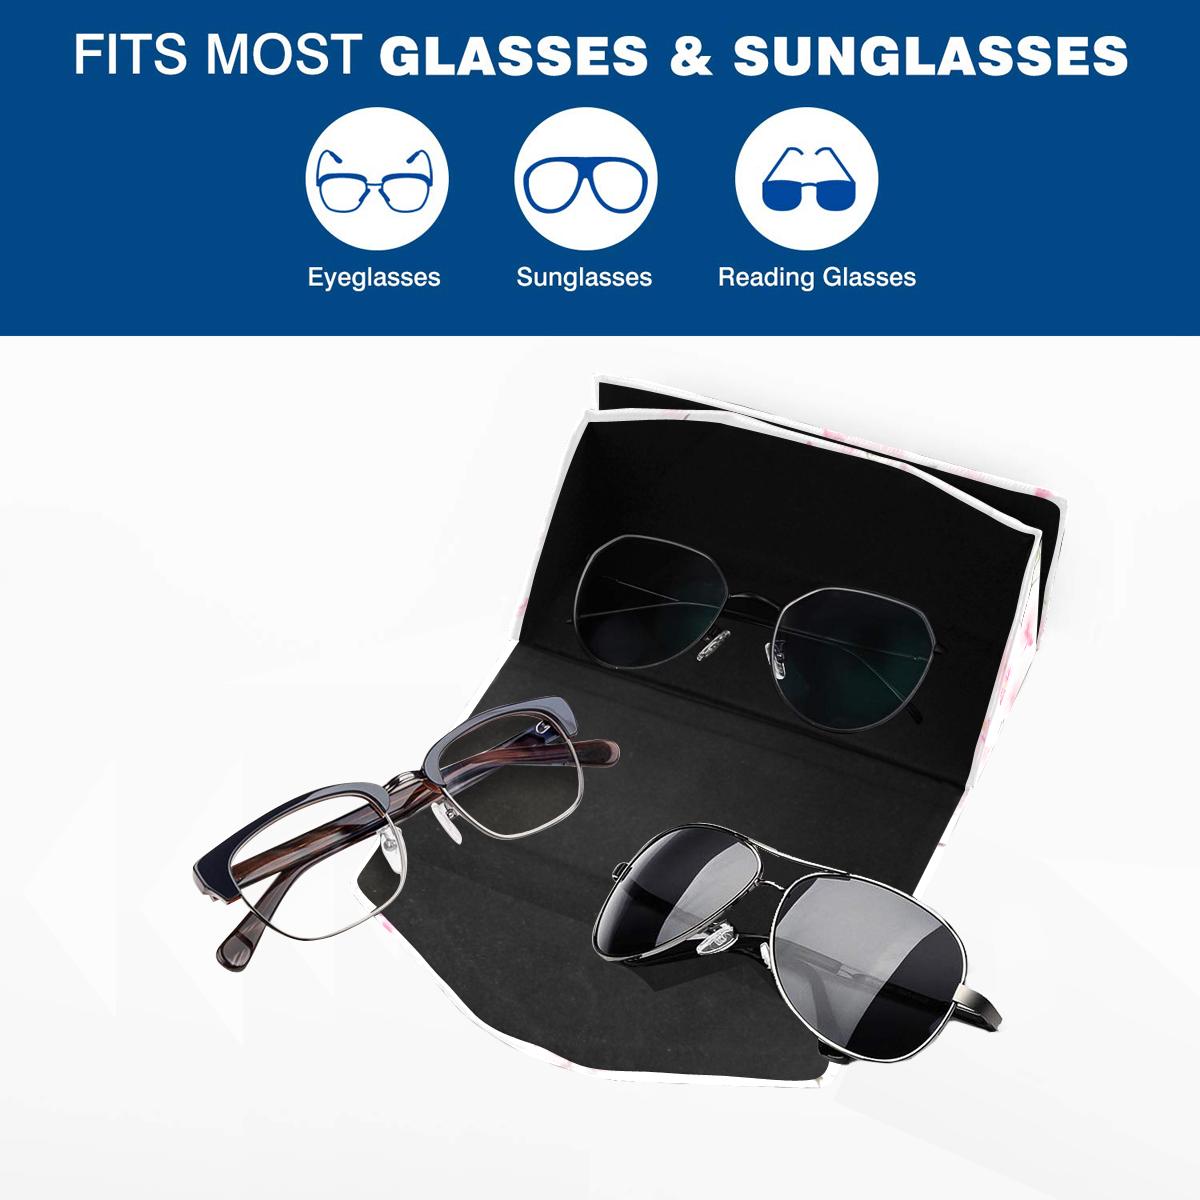 Pattern Orchidées Custom Foldable Glasses Case